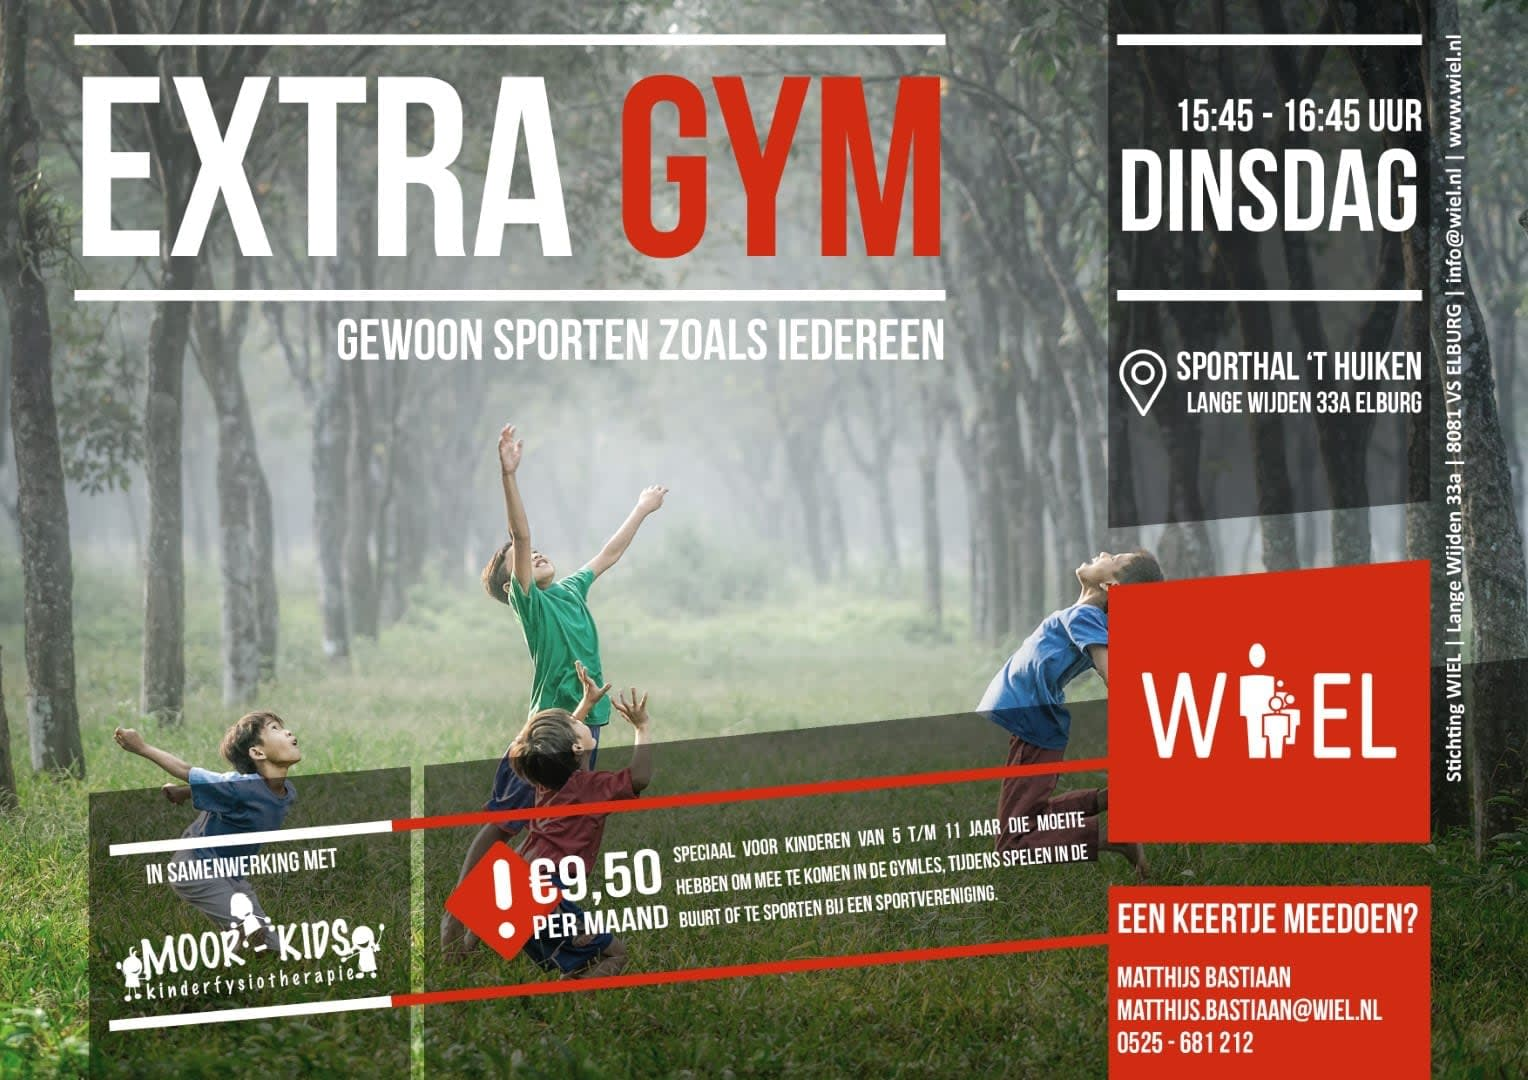 Extra Gym - Stichting WIEL